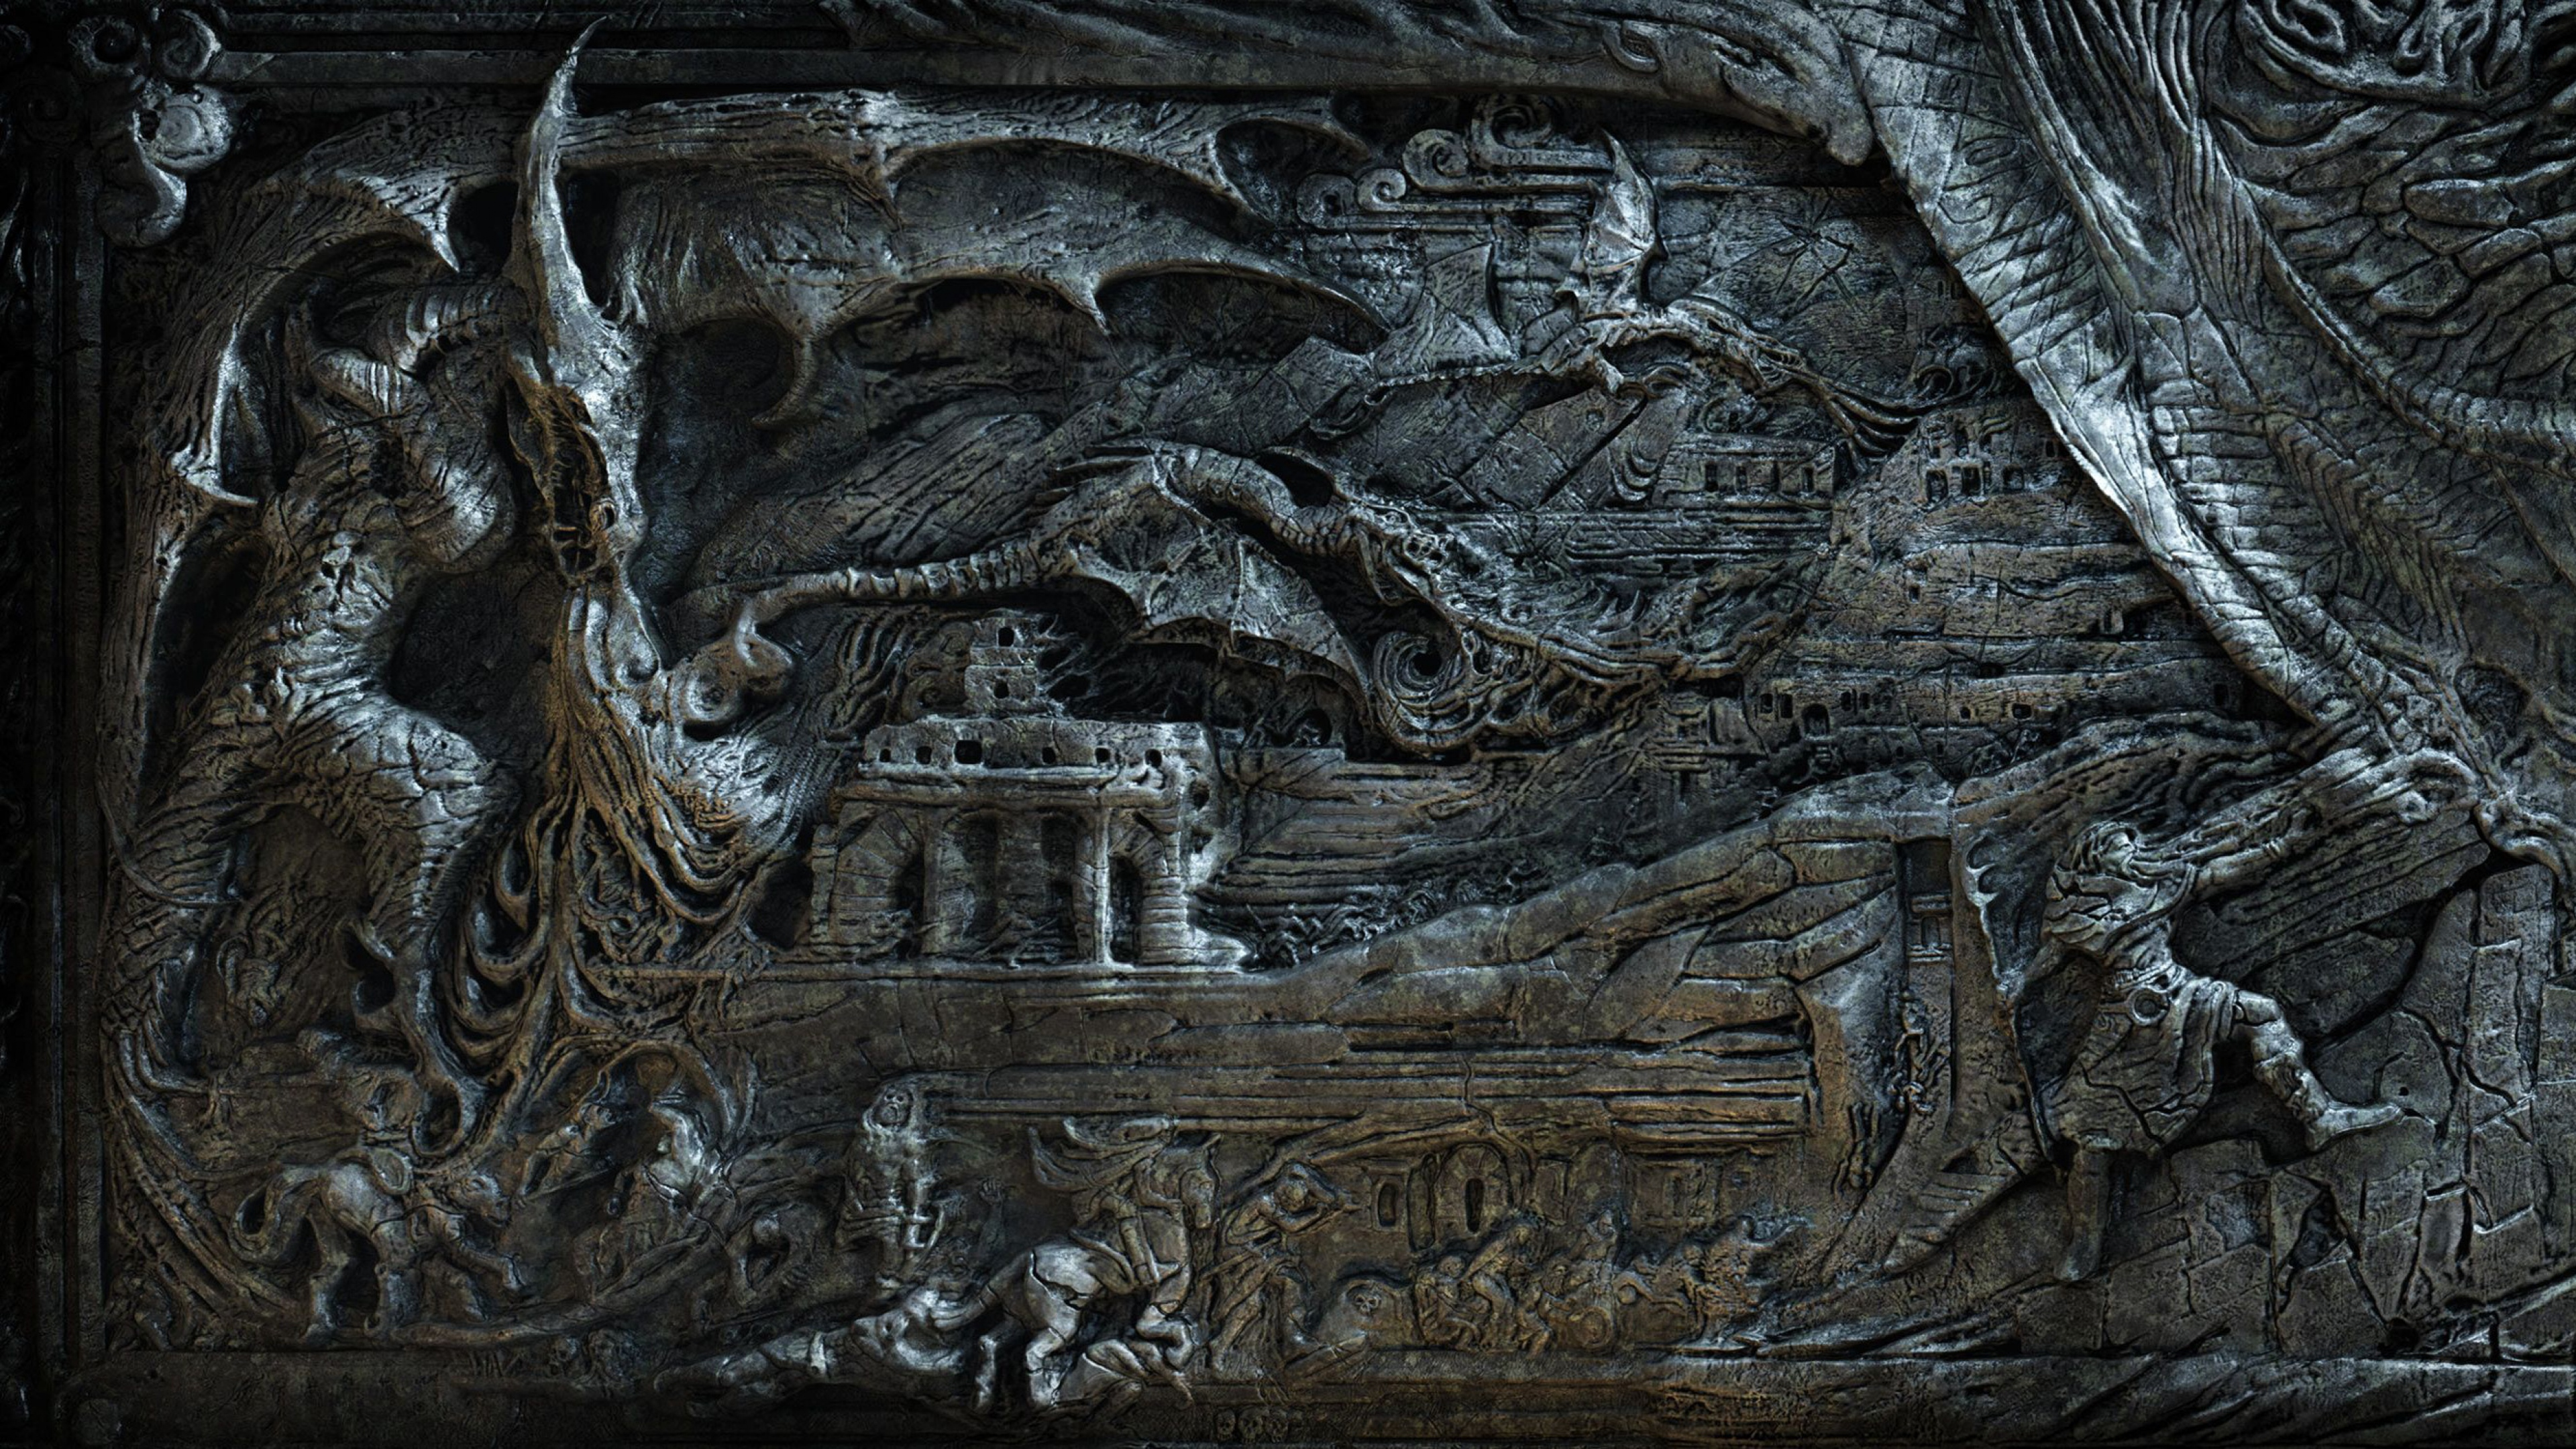 Download Wallpaper 3840x2160 The elder scrolls Skyrim Bas Magician 3840x2160